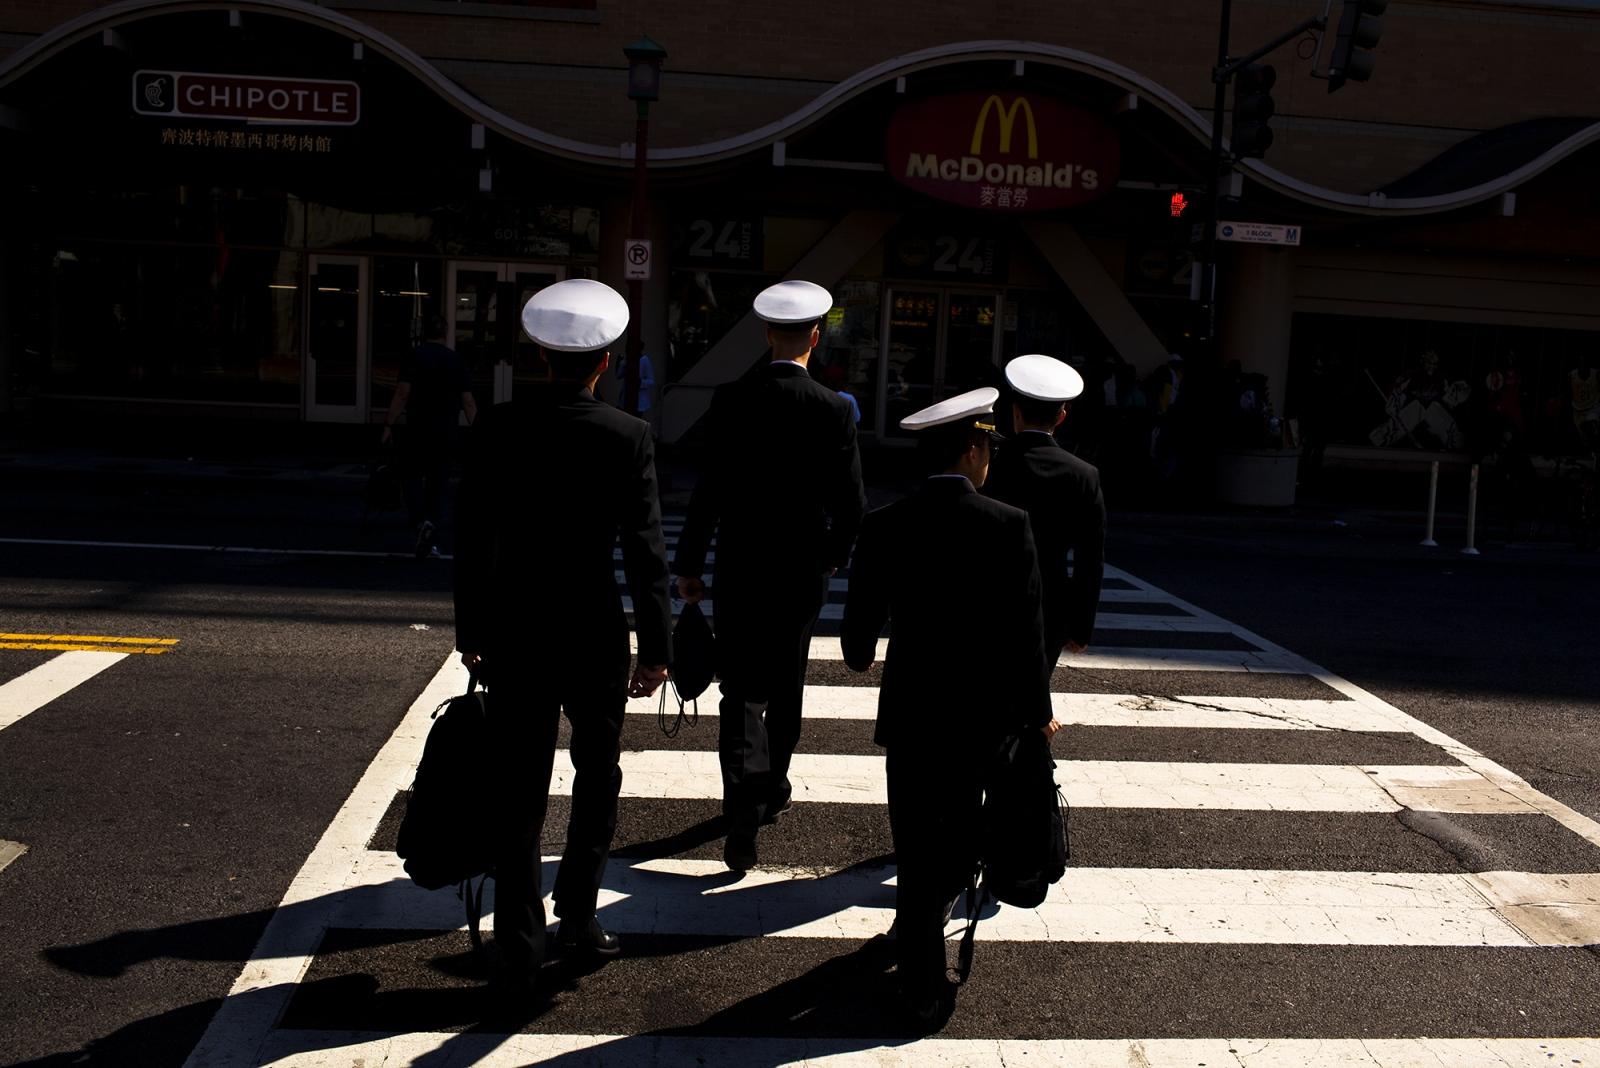 Sailors cross 7th street,Washington D.C.